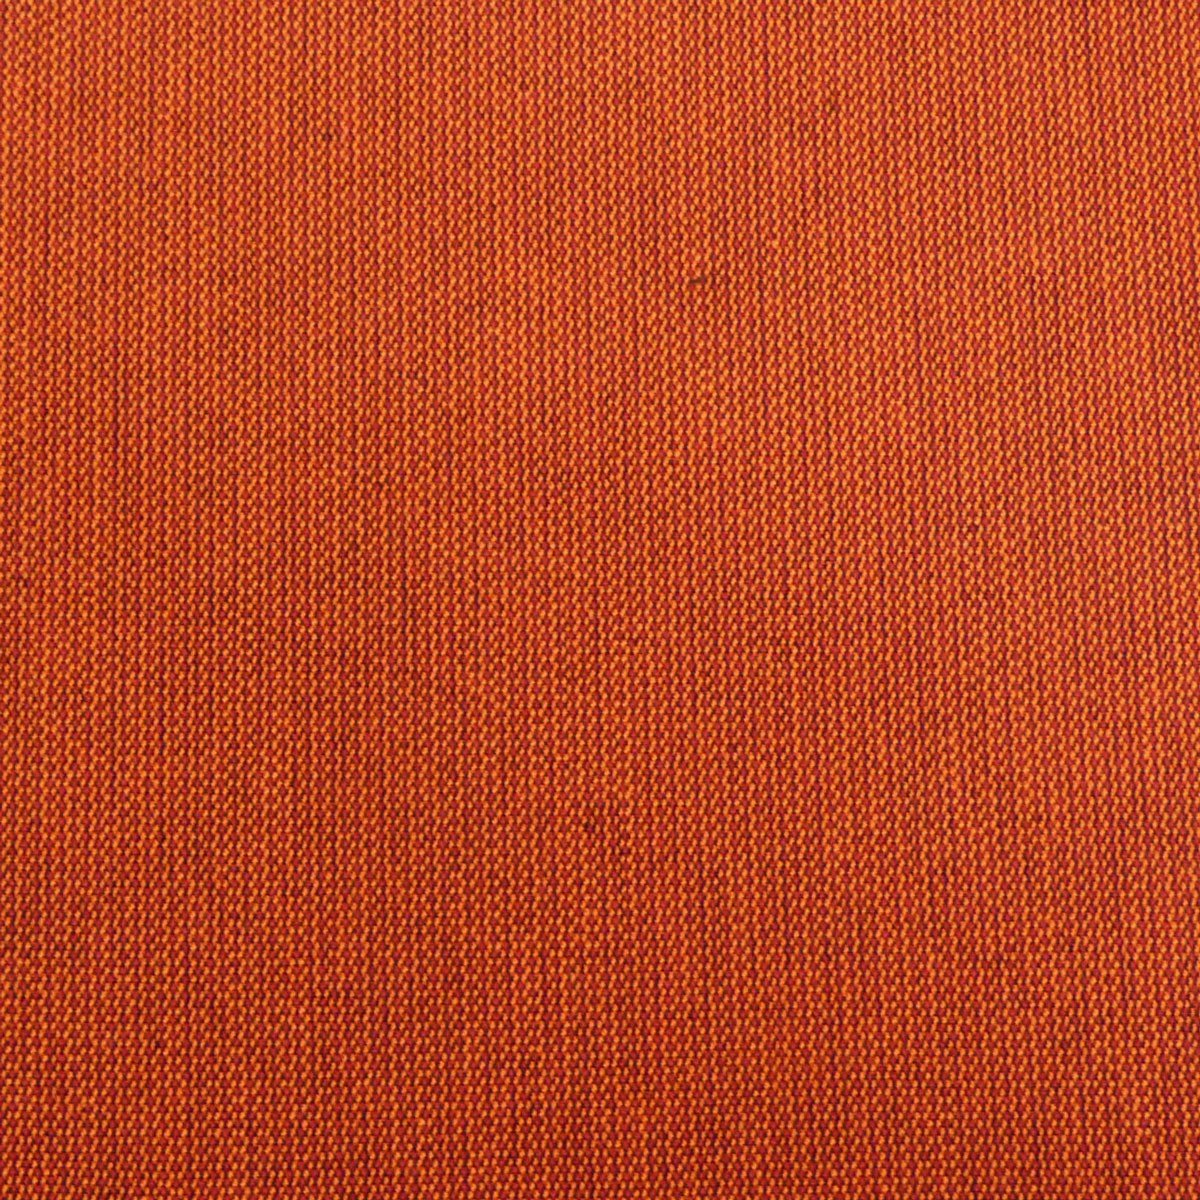 Schöner-Leben Outdoor Fabric Canopy Fabric Garden Furniture Material Textured Terracotta Orange